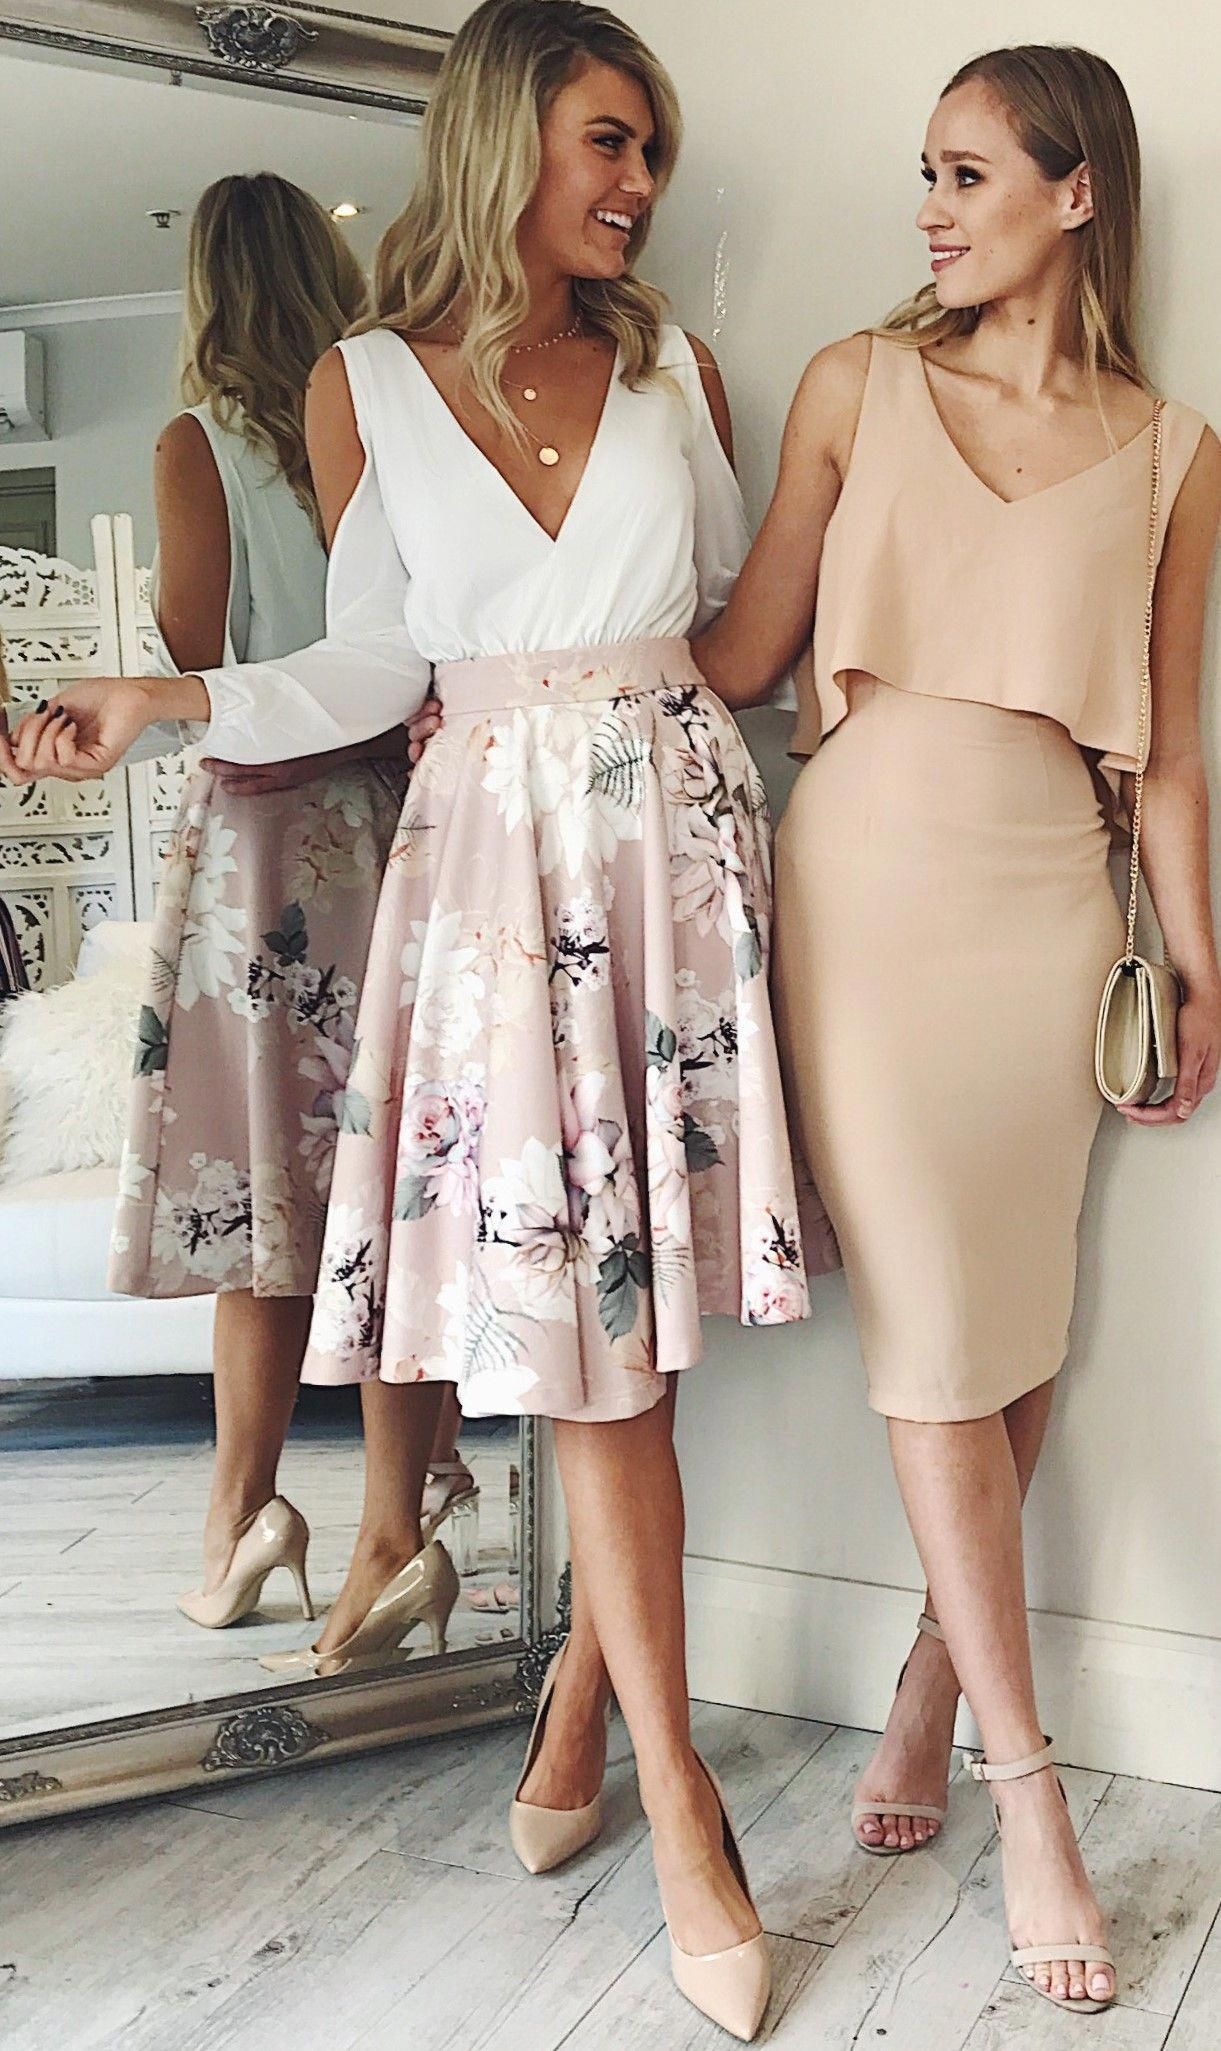 Be A Boss Lady Weddingguestdress Wedding Outfits For Women Cheap Dresses Casual Casual Dresses For Women [ 2051 x 1221 Pixel ]